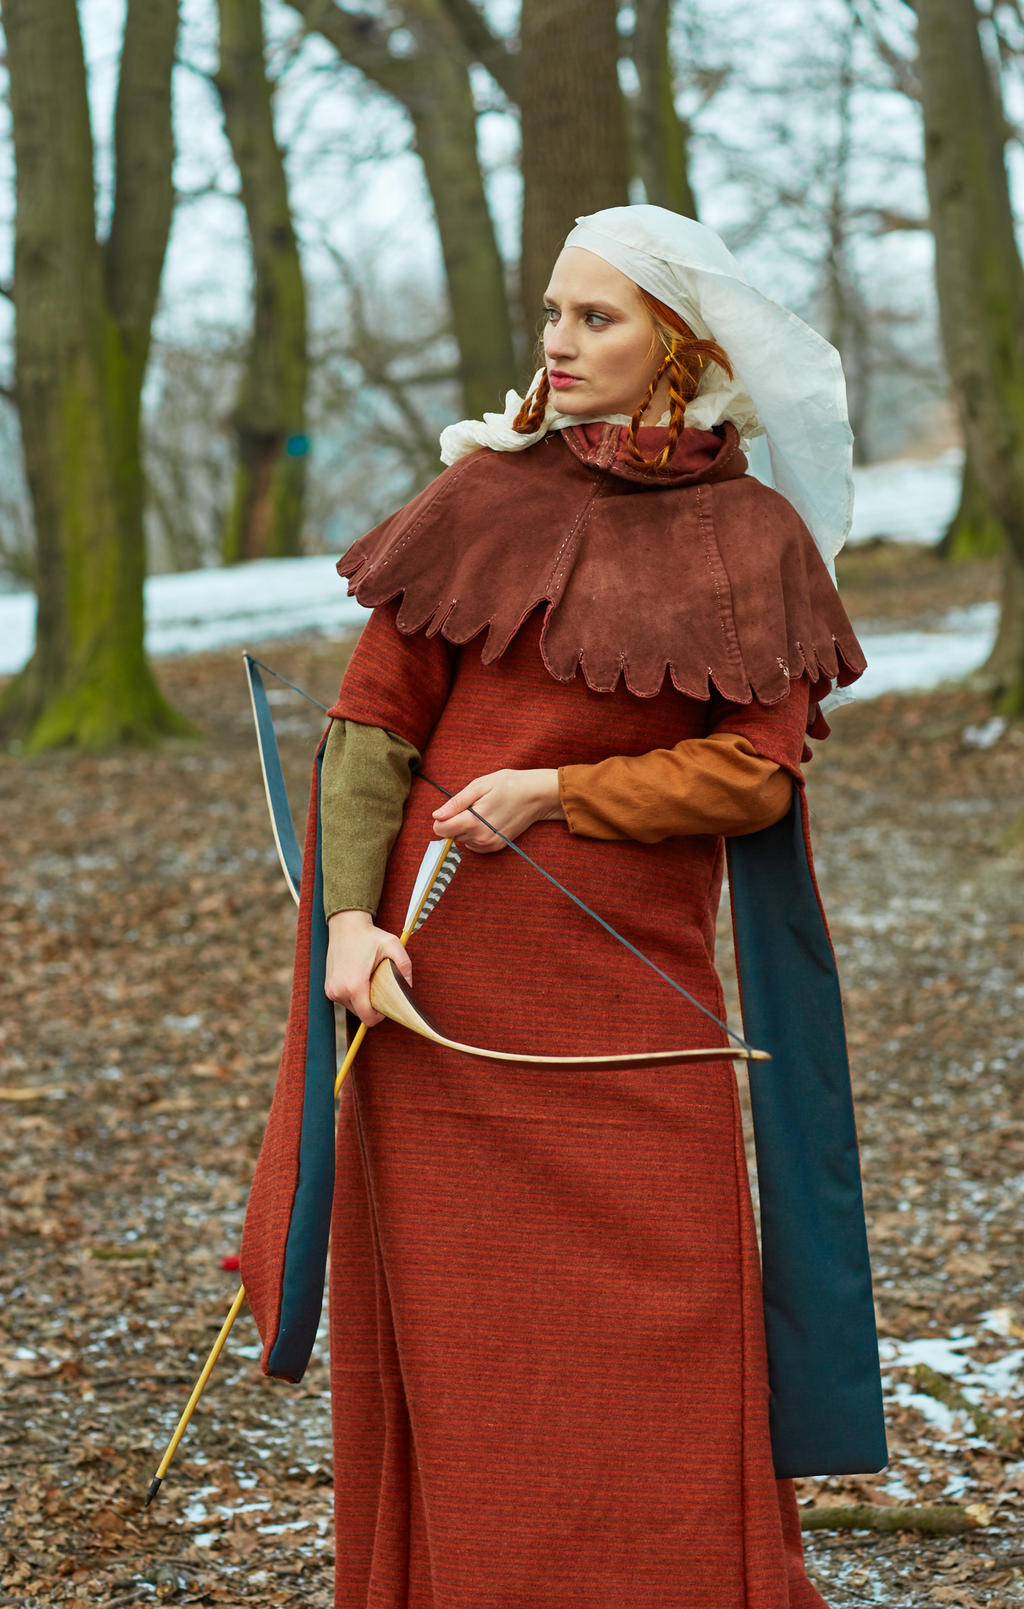 Lady Hunter - Medieval Renaissance Clothing, Costumes